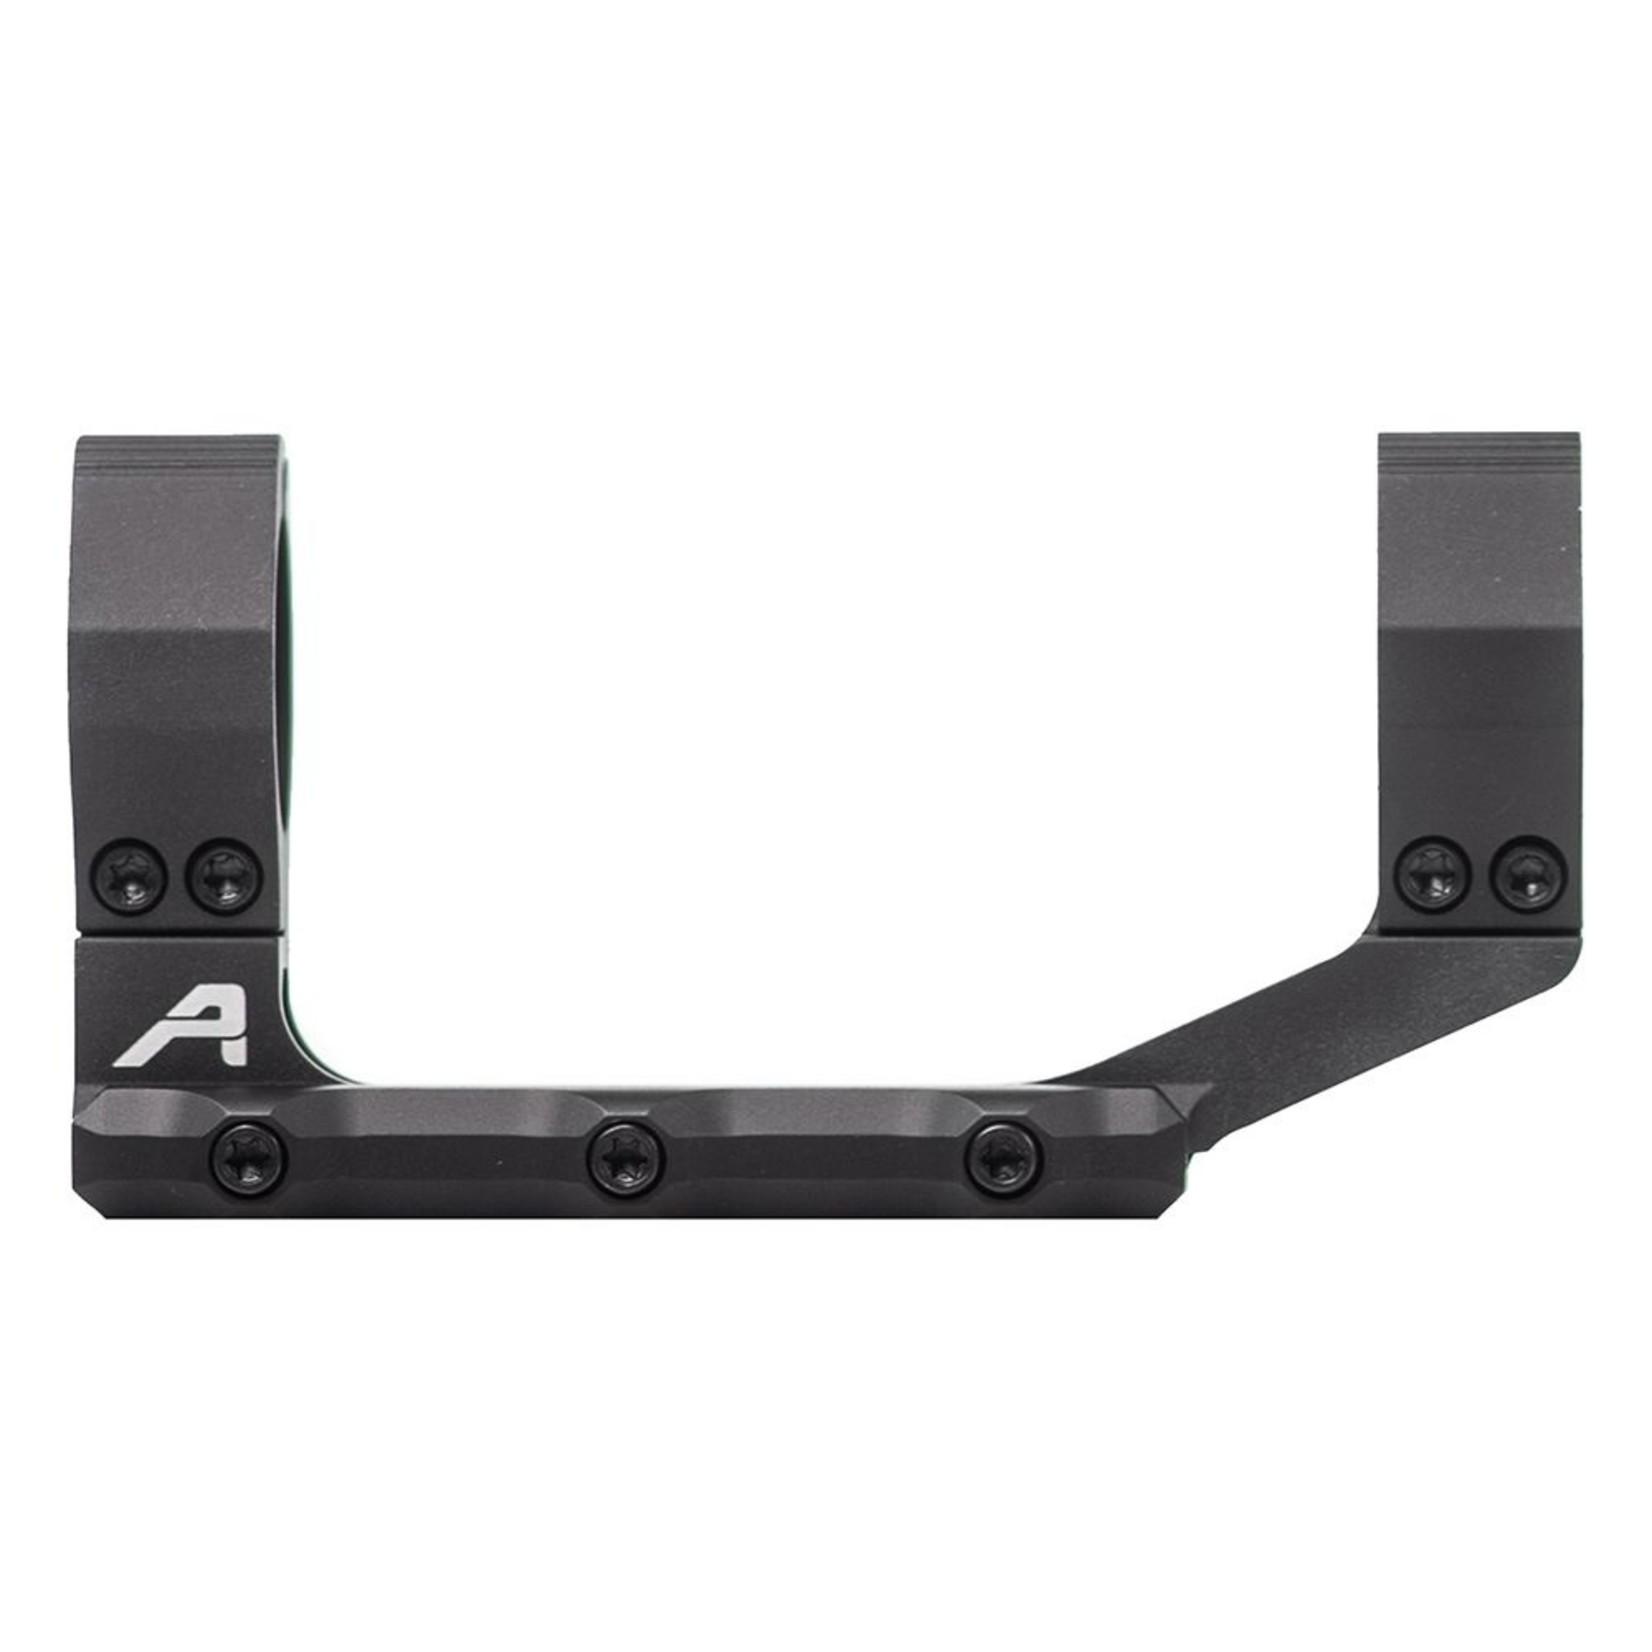 "Aero Aero Ultralight 1"" Scope Mount, SPR - Anodized Black"